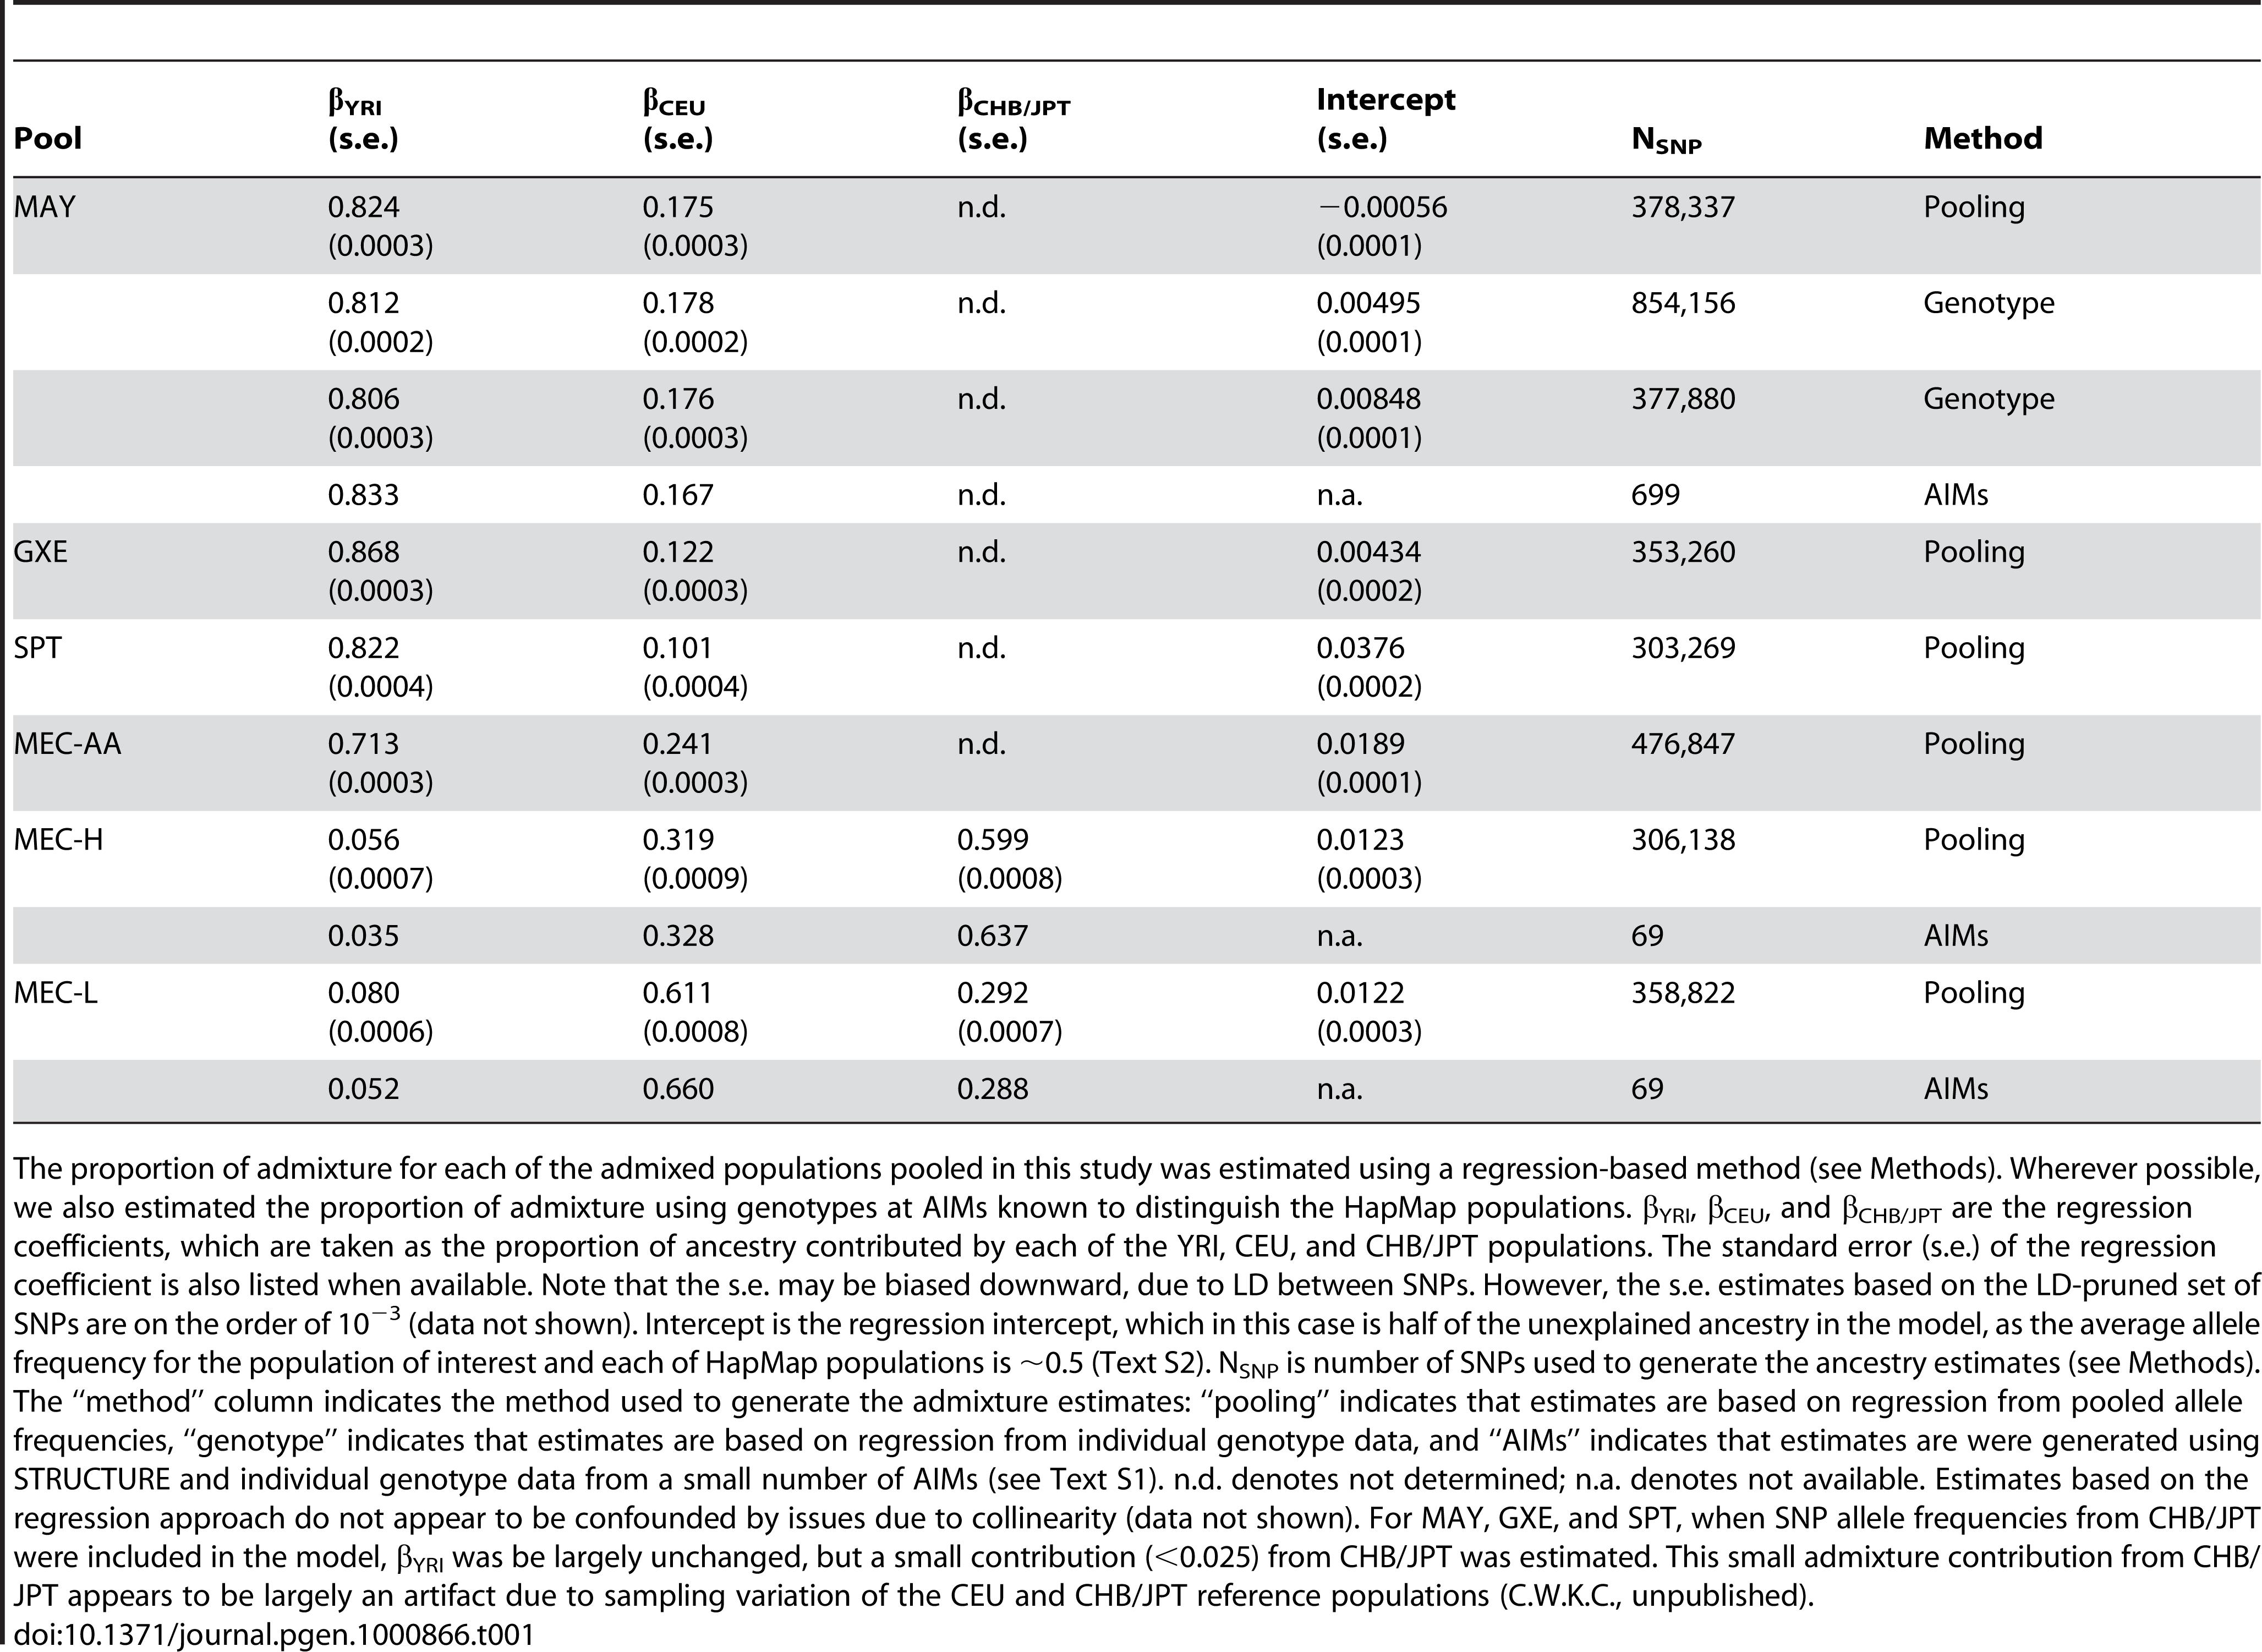 Comparison of estimates of admixture proportion.